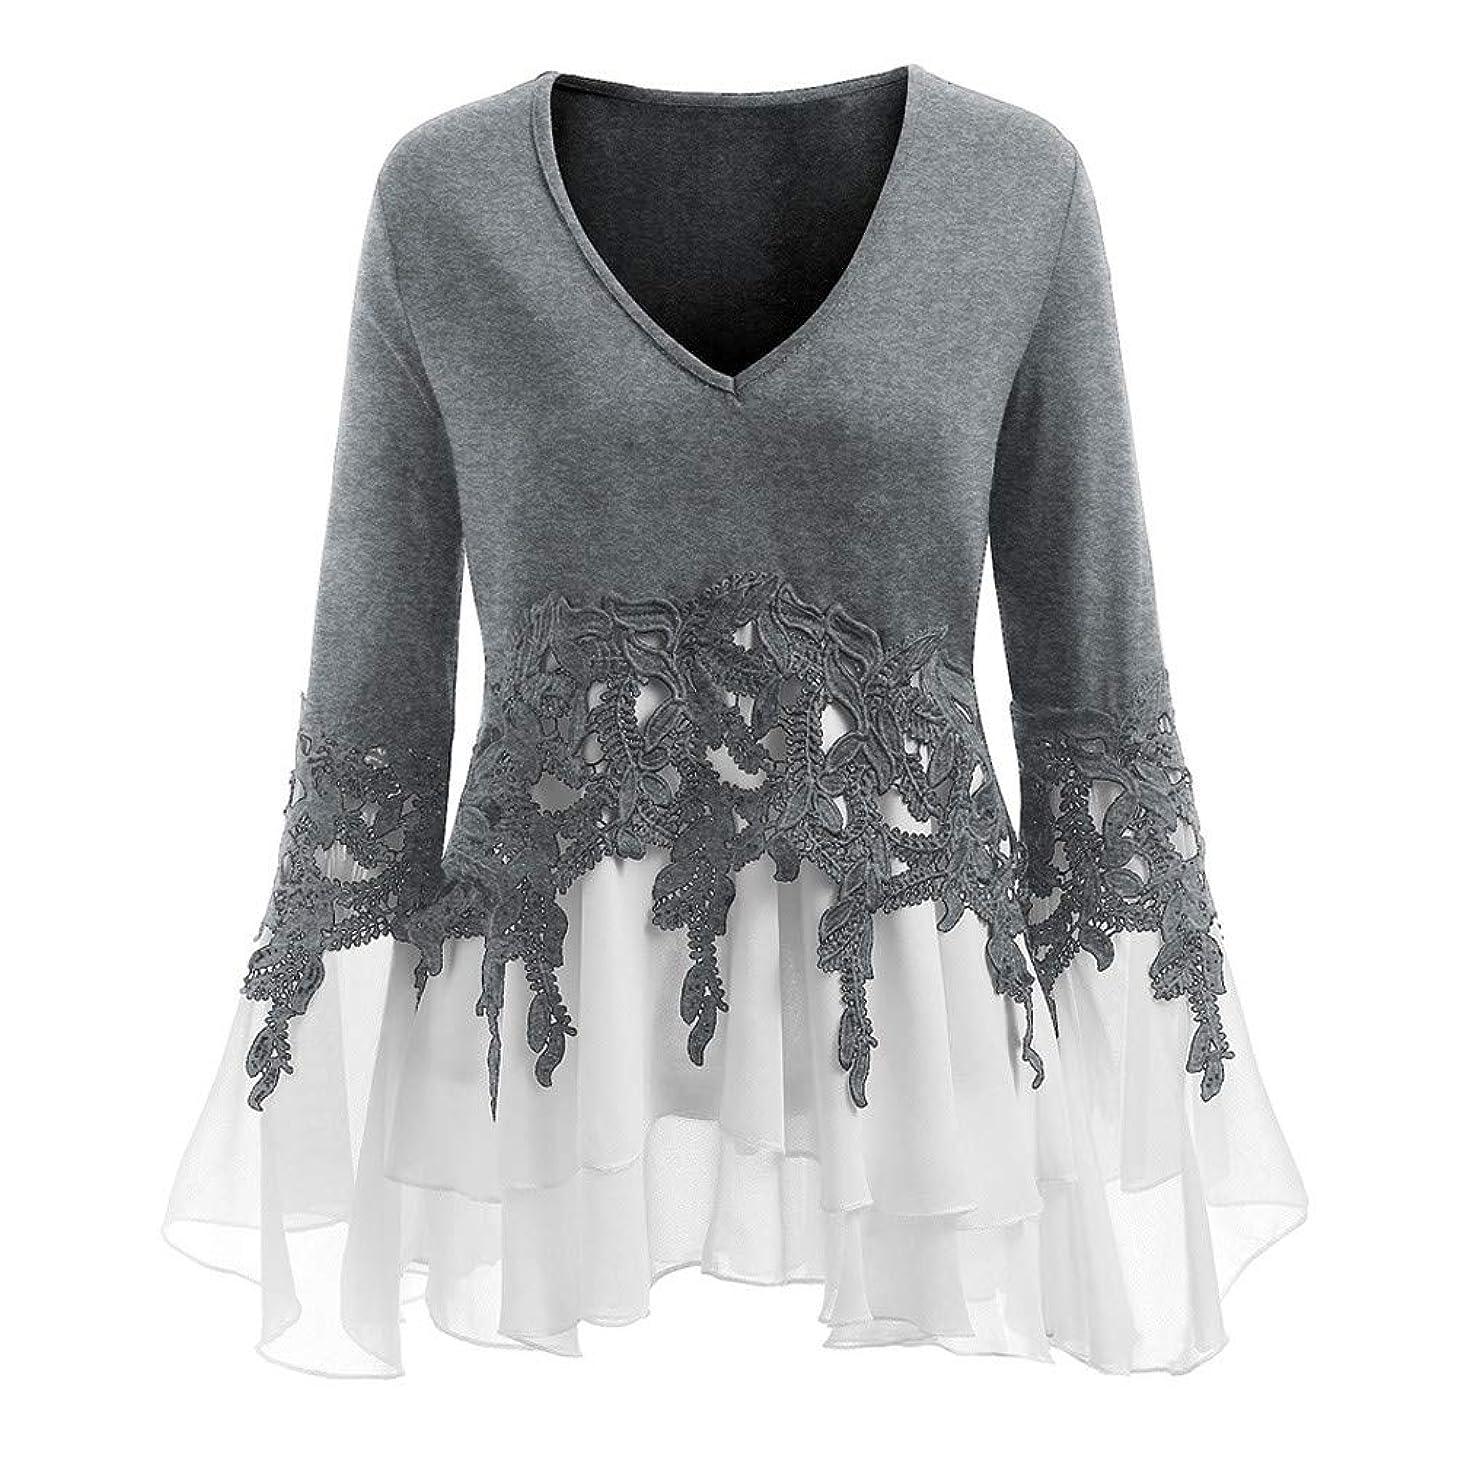 Hotkey Womens Long Sleeve Rash Guard Womens Casual Applique Flowy Chiffon V-Neck Long Sleeve Blouse Tops